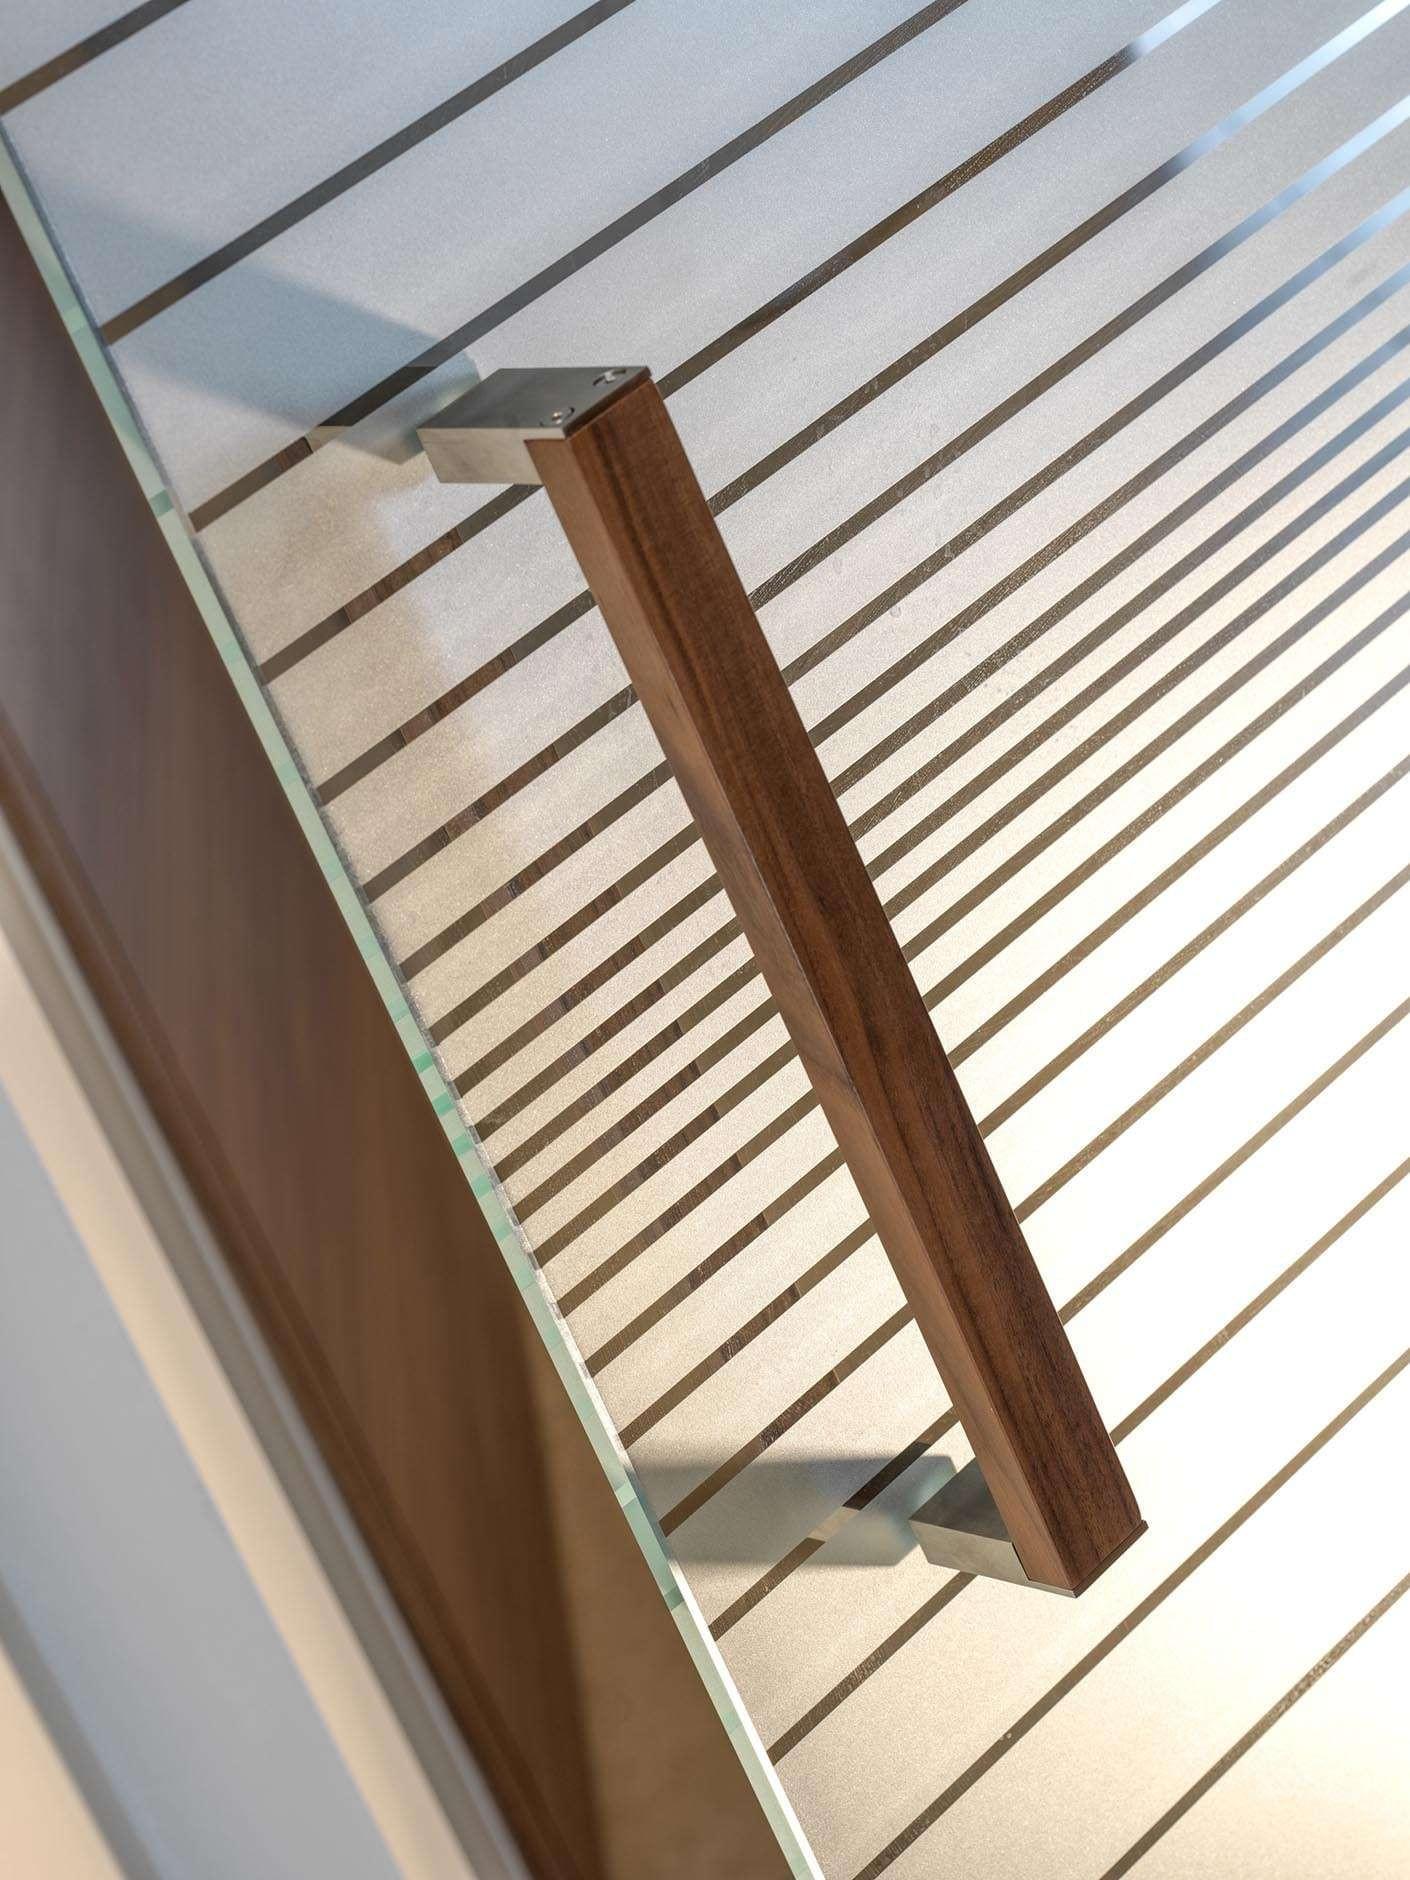 glazen-deur-tekening-houten-trekker